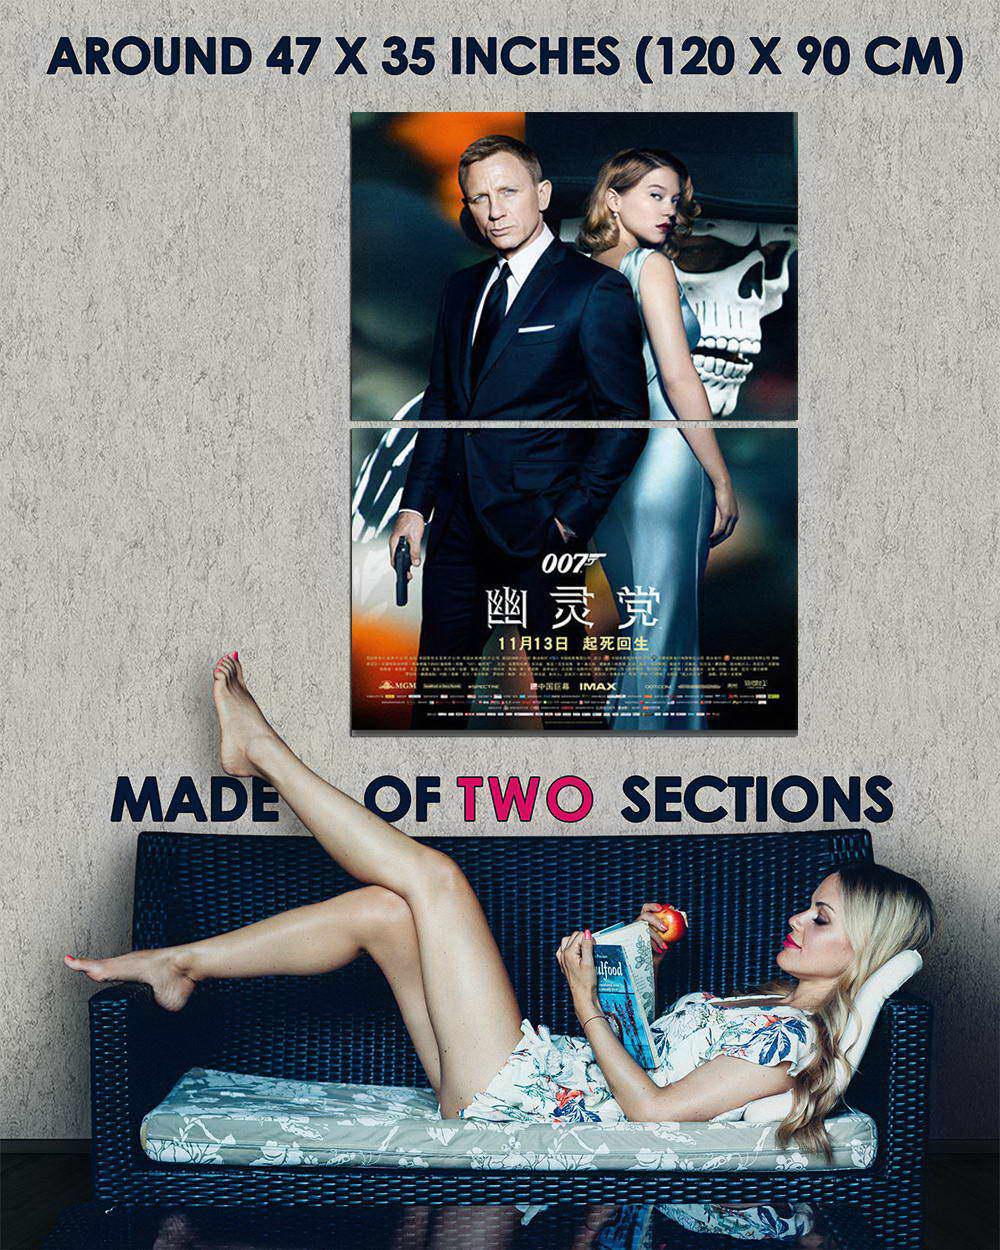 10785-James-Bond-24-Spectre-2-Mo-Art-LAMINATED-POSTER-CA thumbnail 5